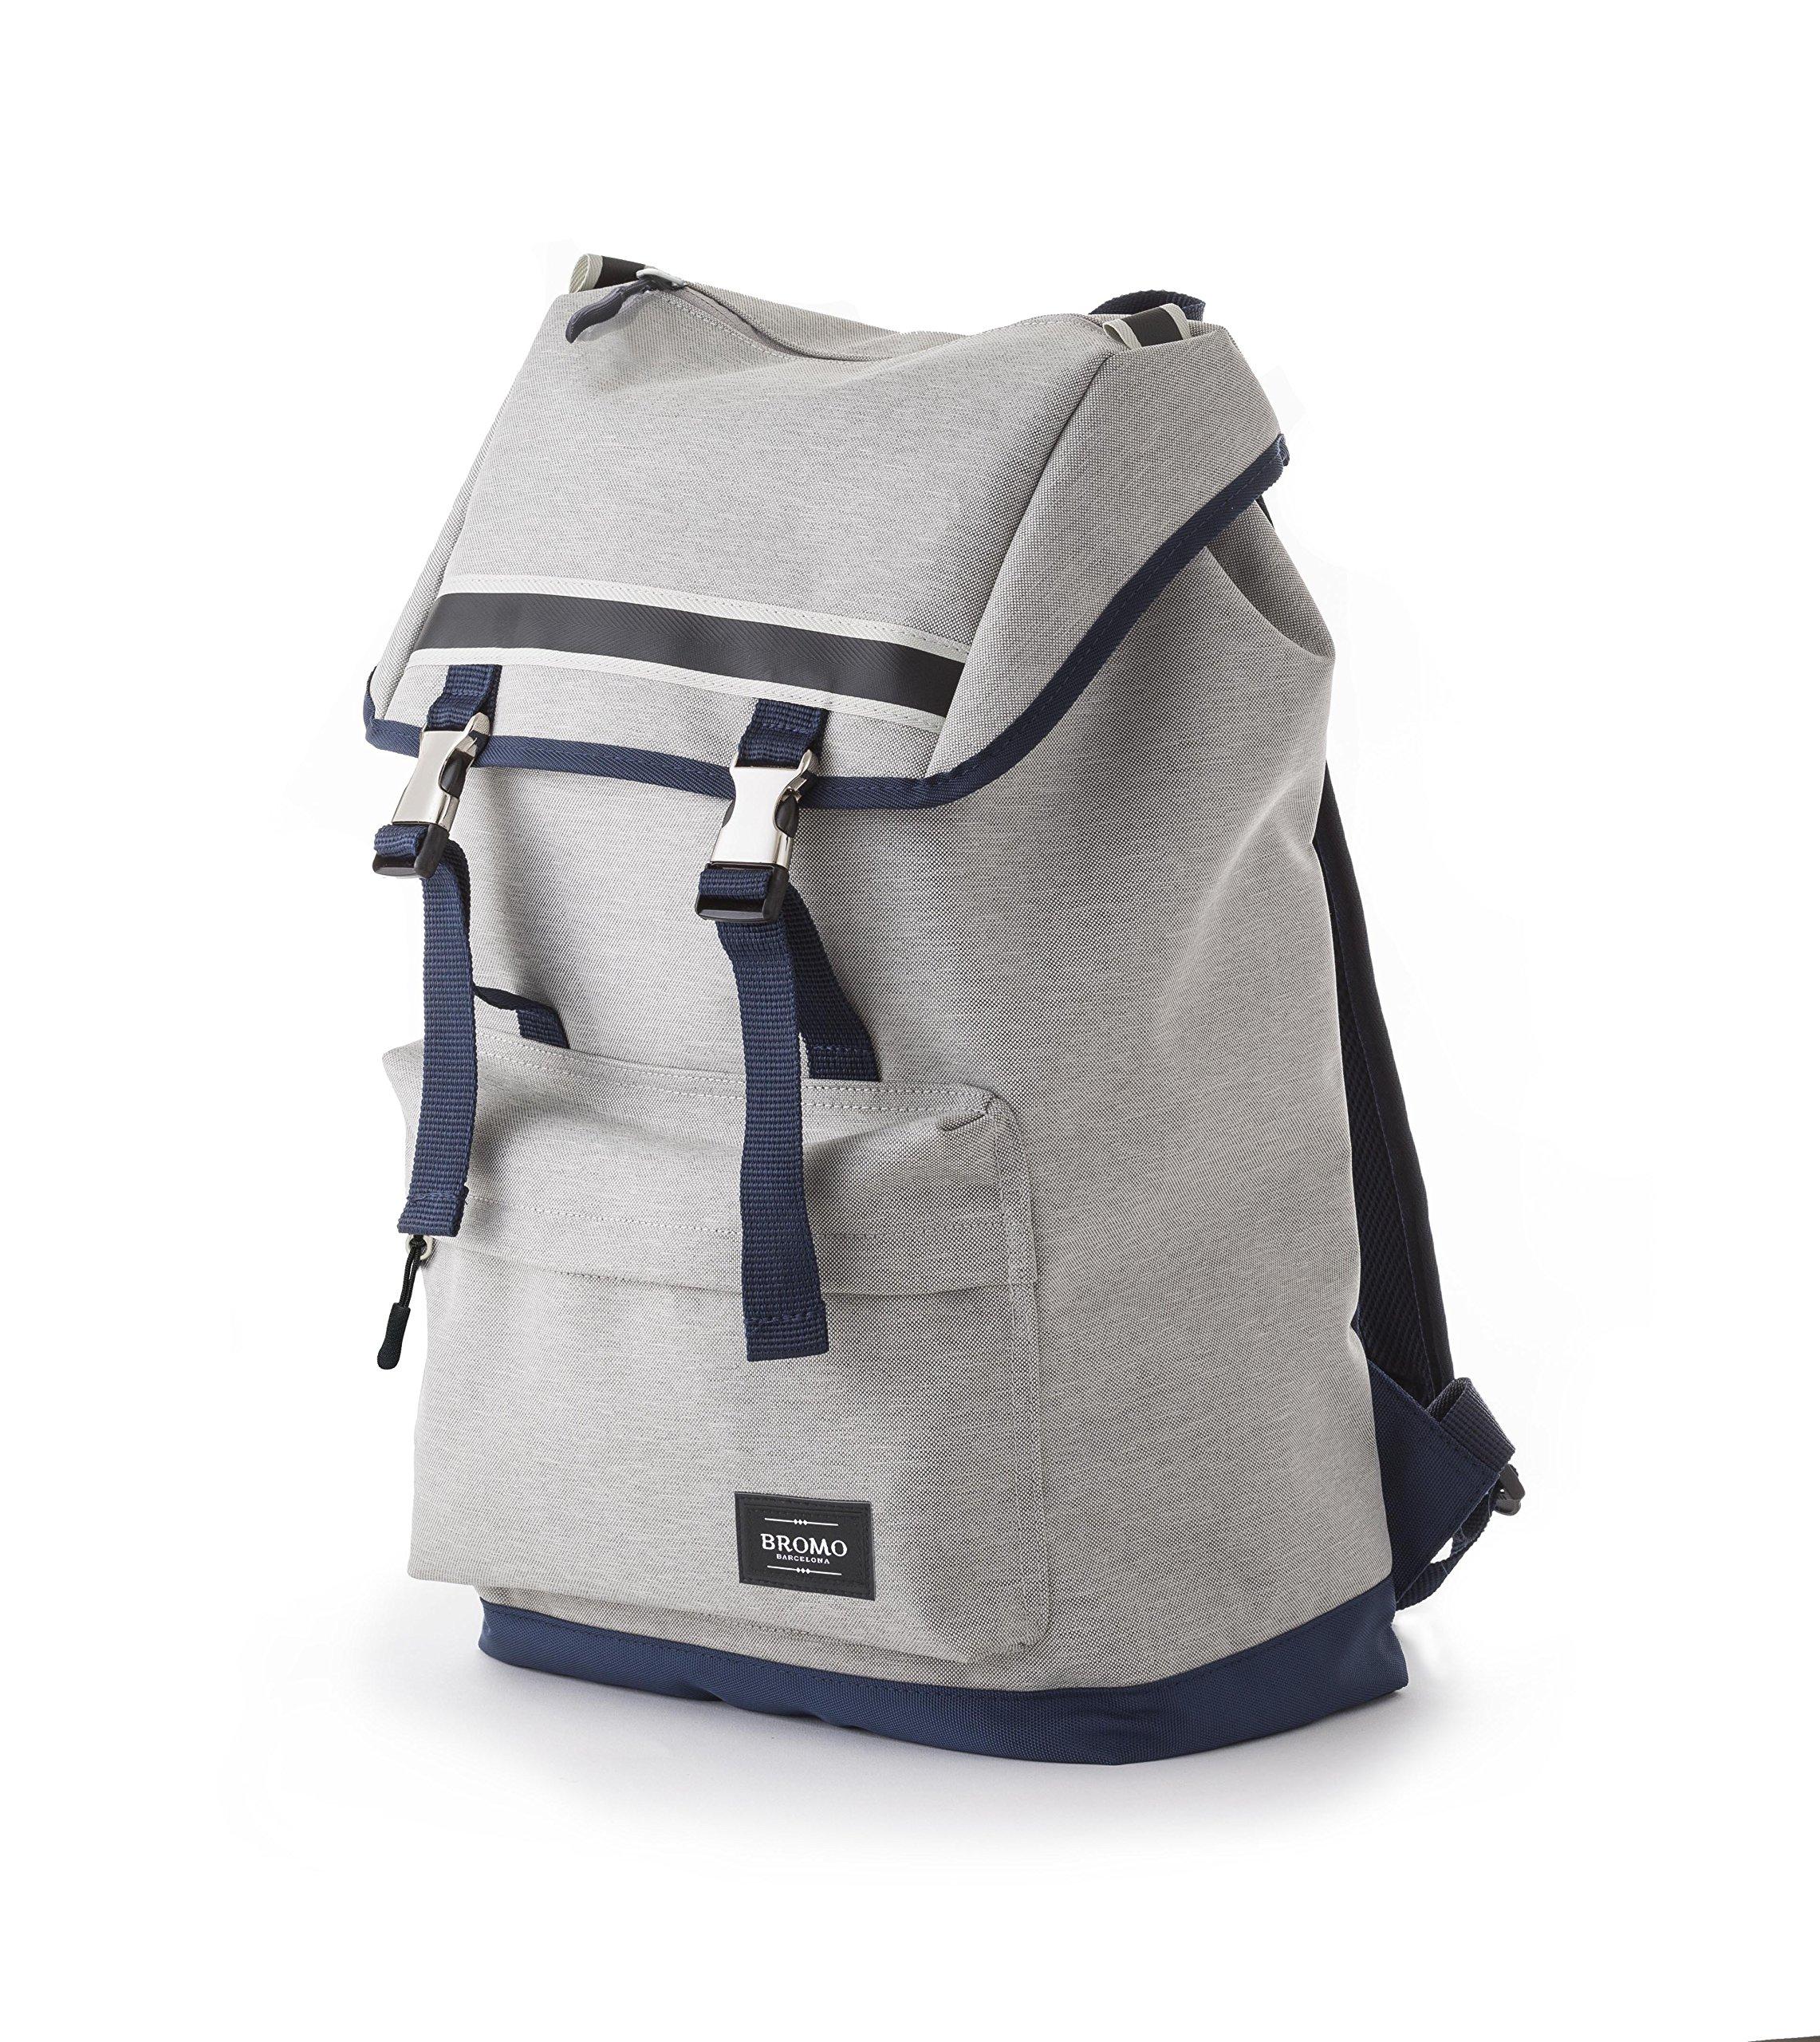 BROMO BARCELONA ALPA Backpack Compatible with 12 13 15 inch MacBook   15'' Laptop, Tablet Pocket   Laptop Bag for Women Men   Water Resistant Rucksack, Lightweight Canvas, Flip Cover, Zipper Pockets